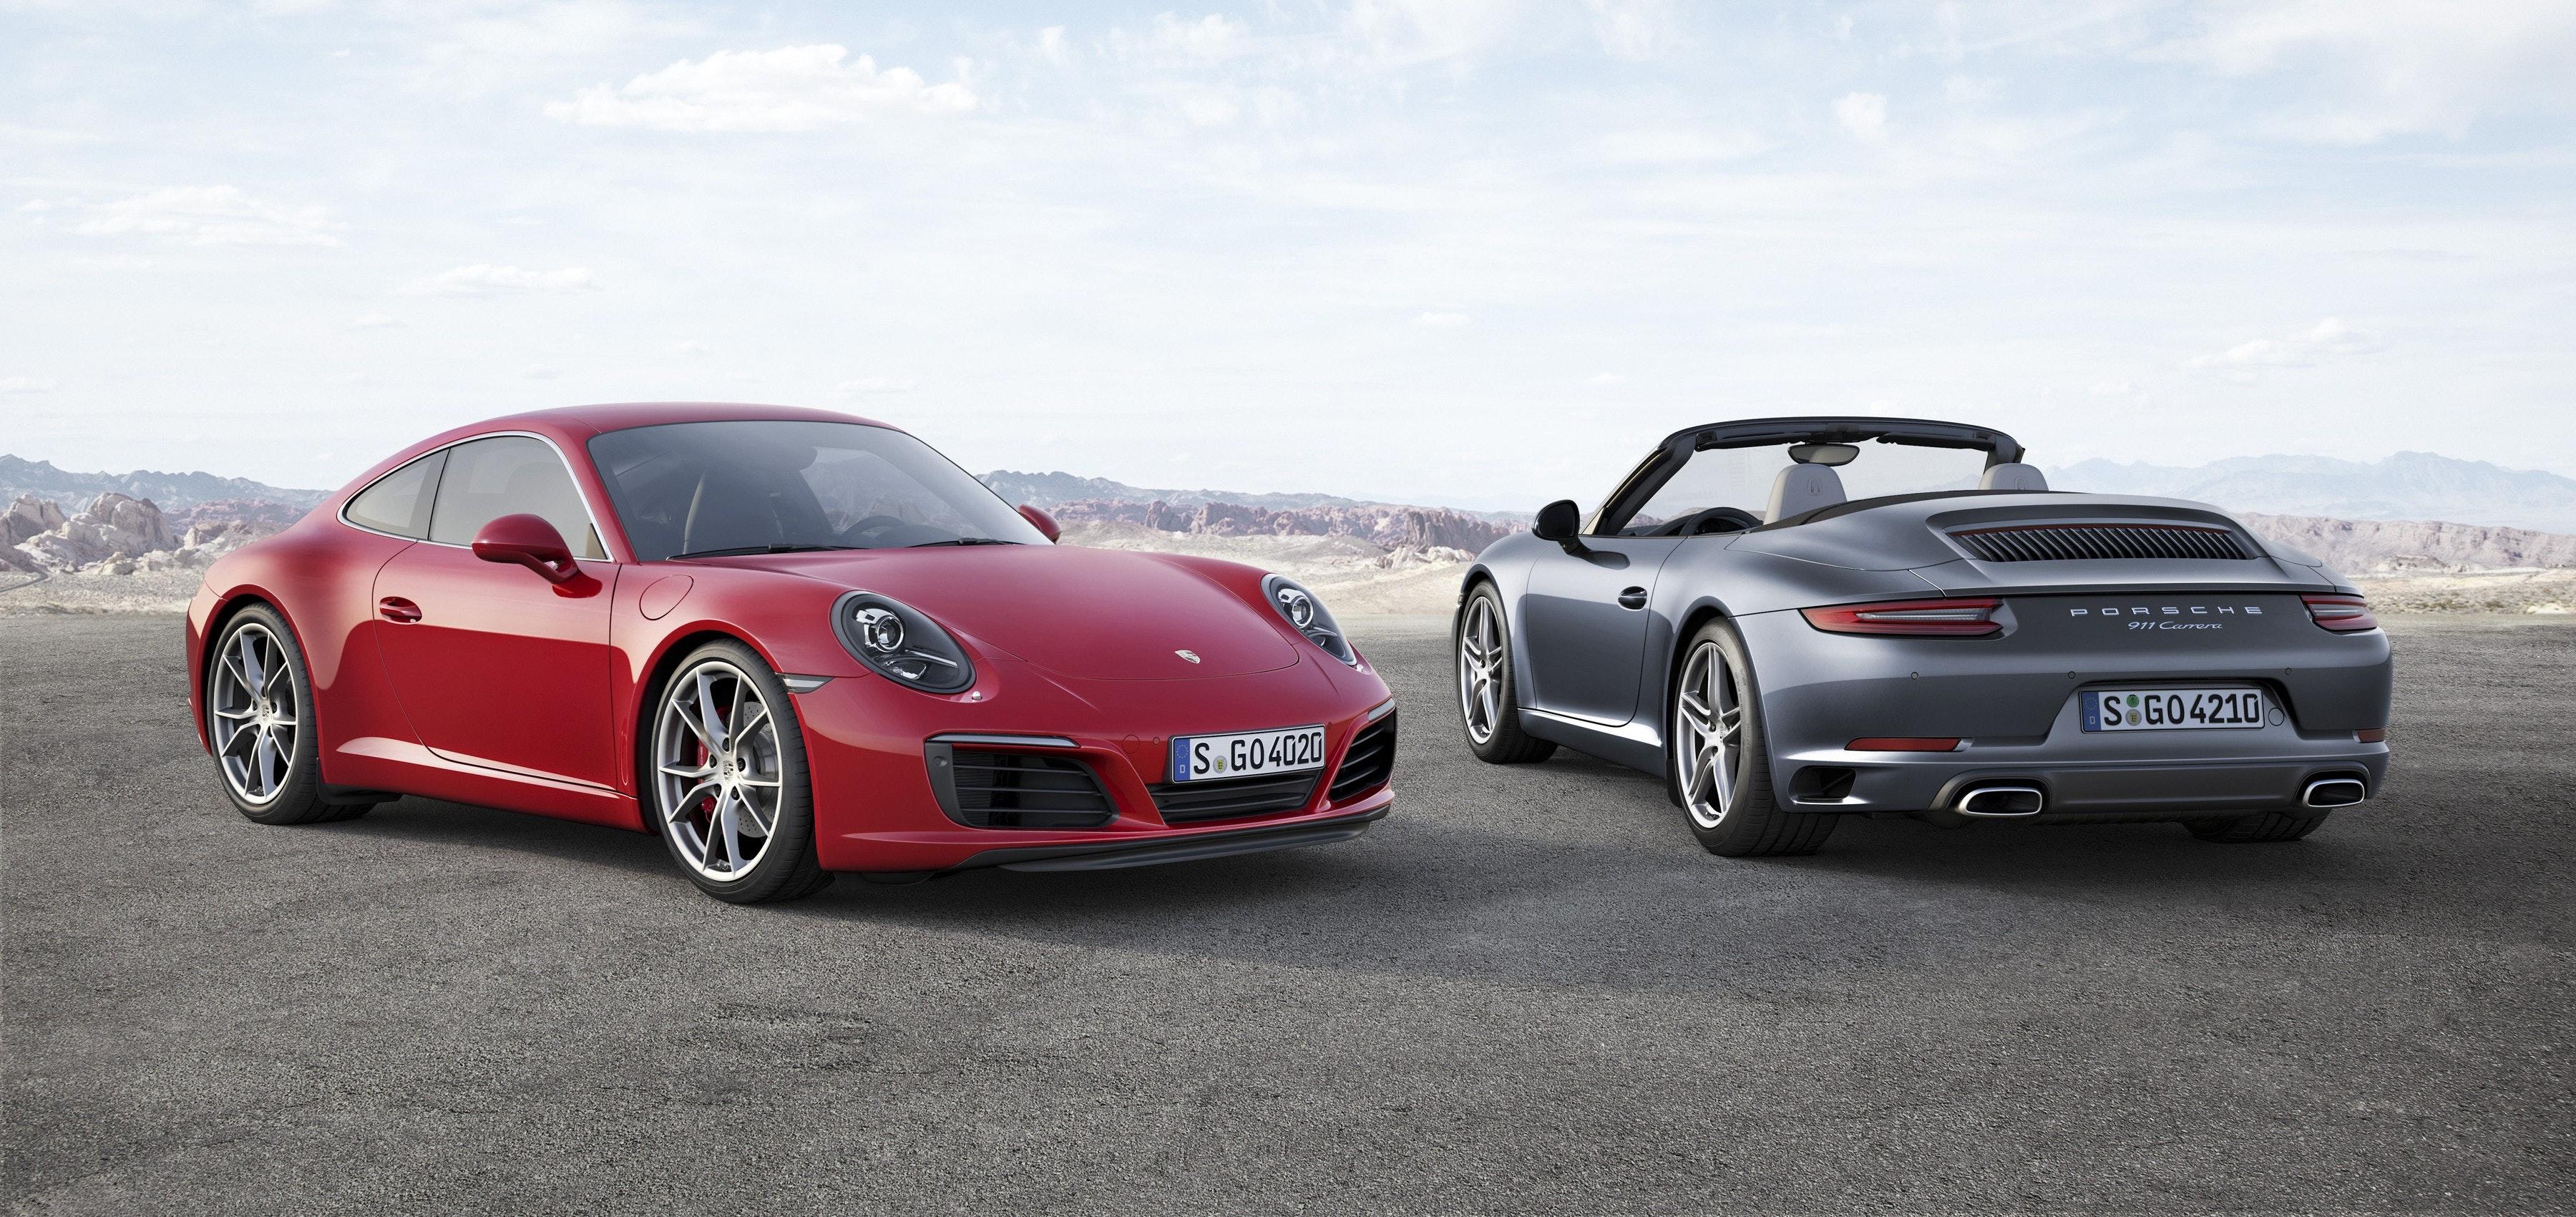 Porsche 911 Amp Cabriolet Sizes Amp Dimensions Guide Carwow